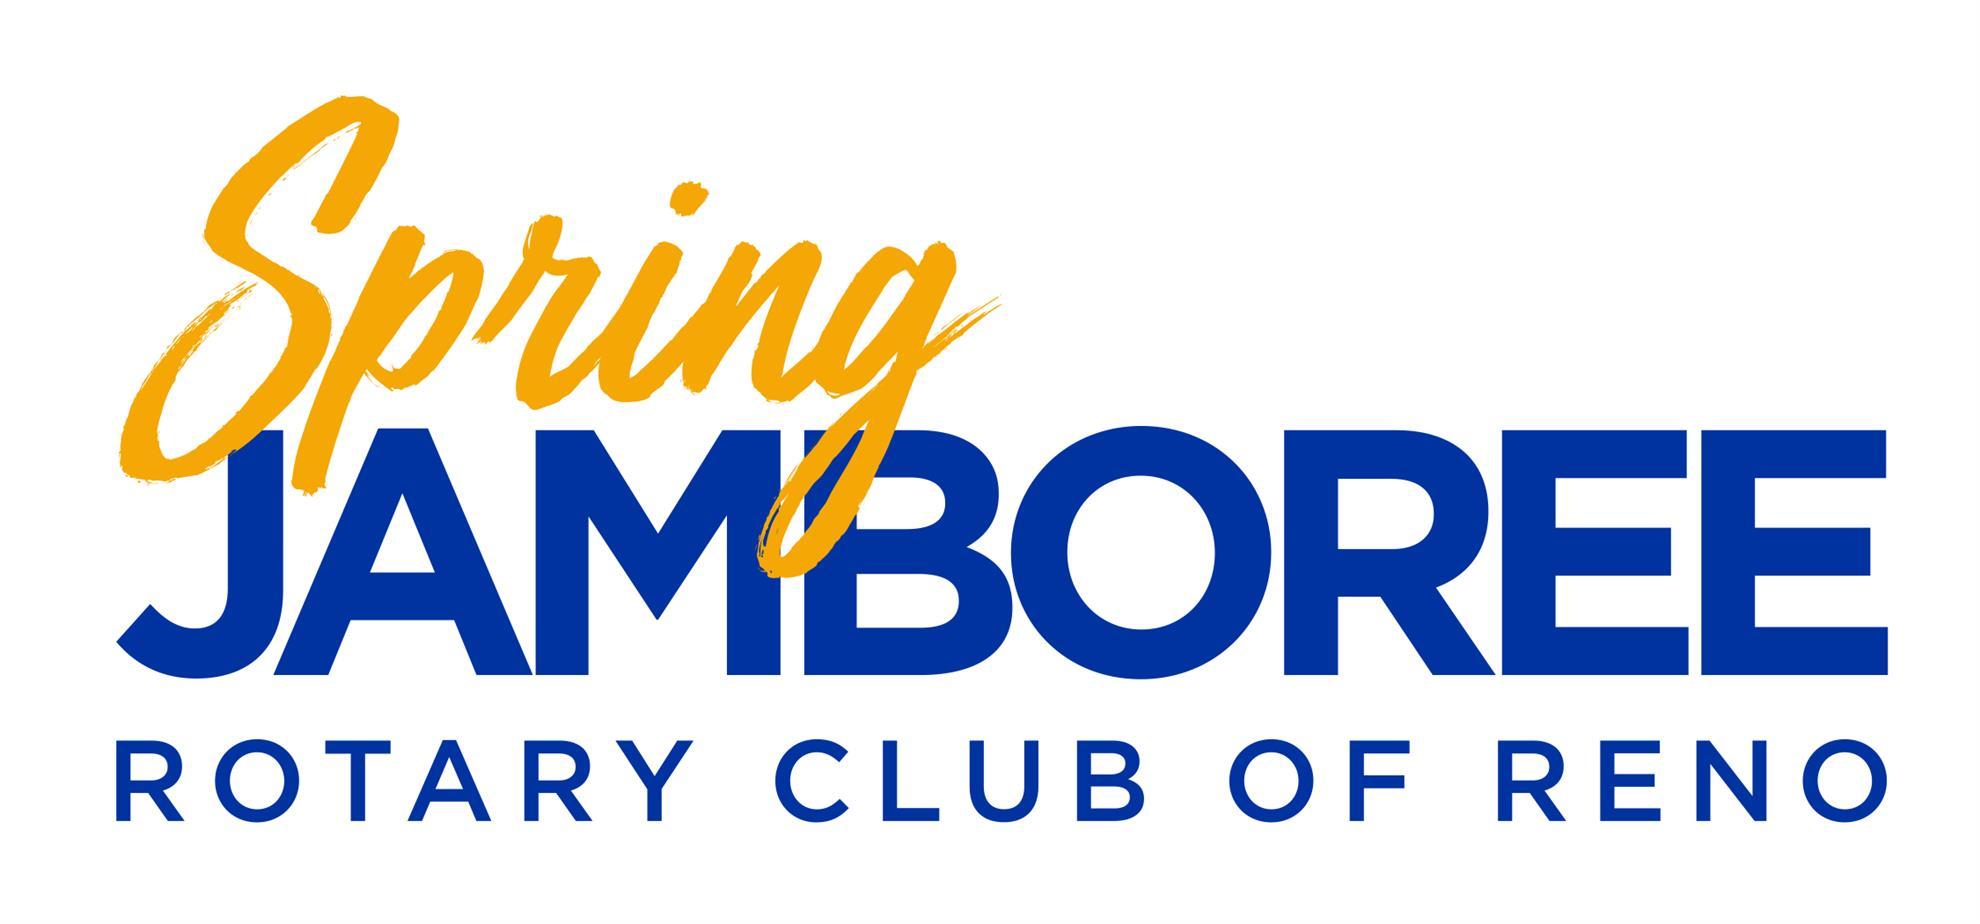 Rotary Spring Jamboree